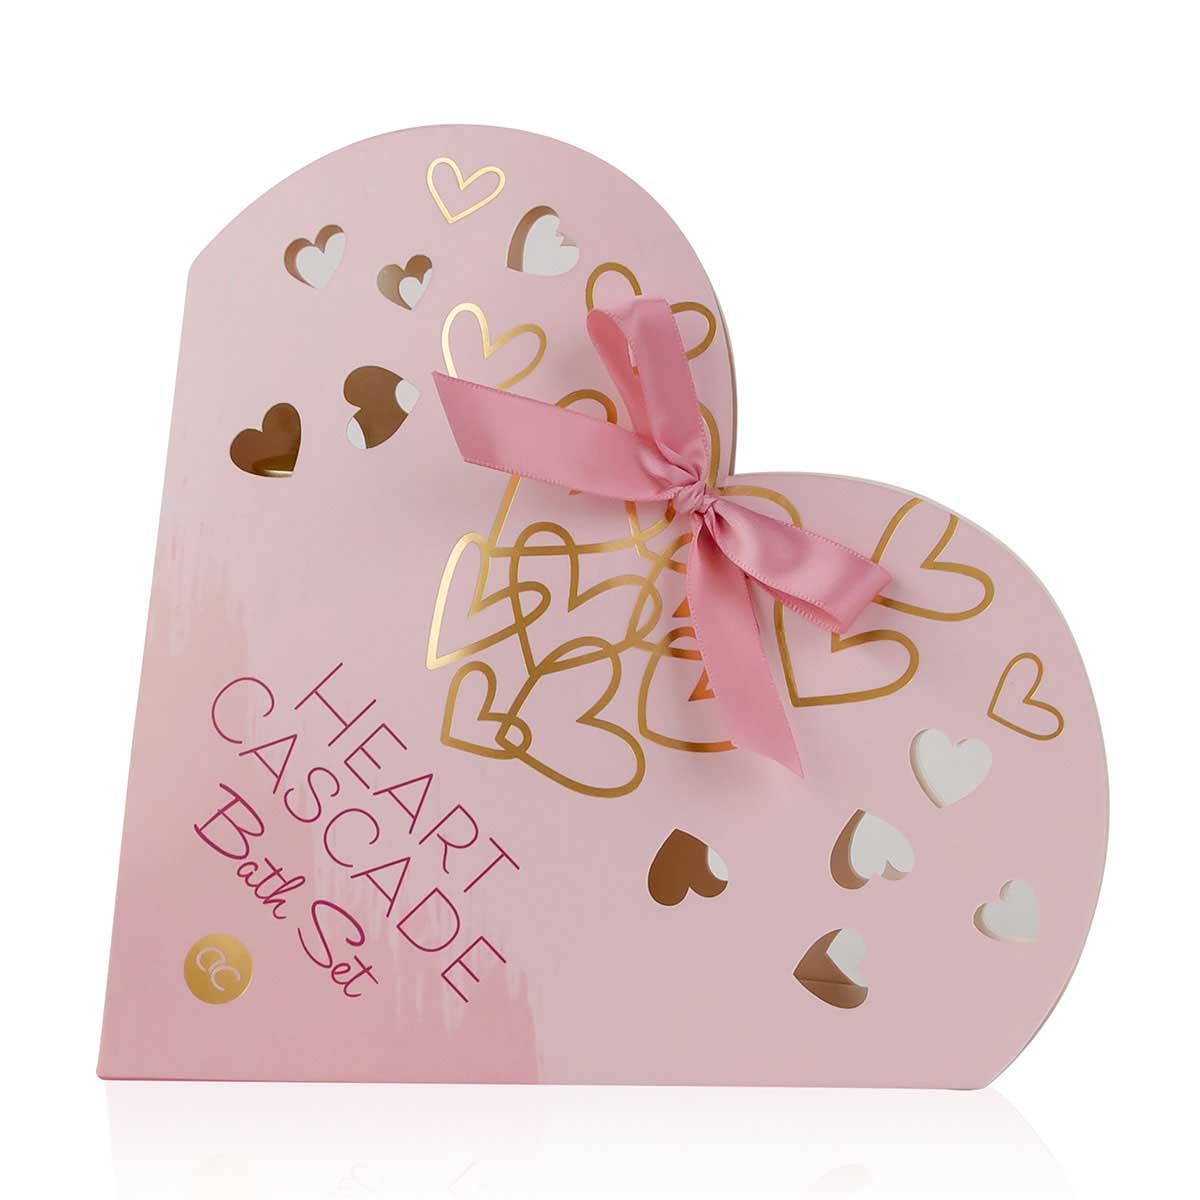 Poklon set negu tela HEART CASCADE u papirnoj poklon kutiji u obliku srca